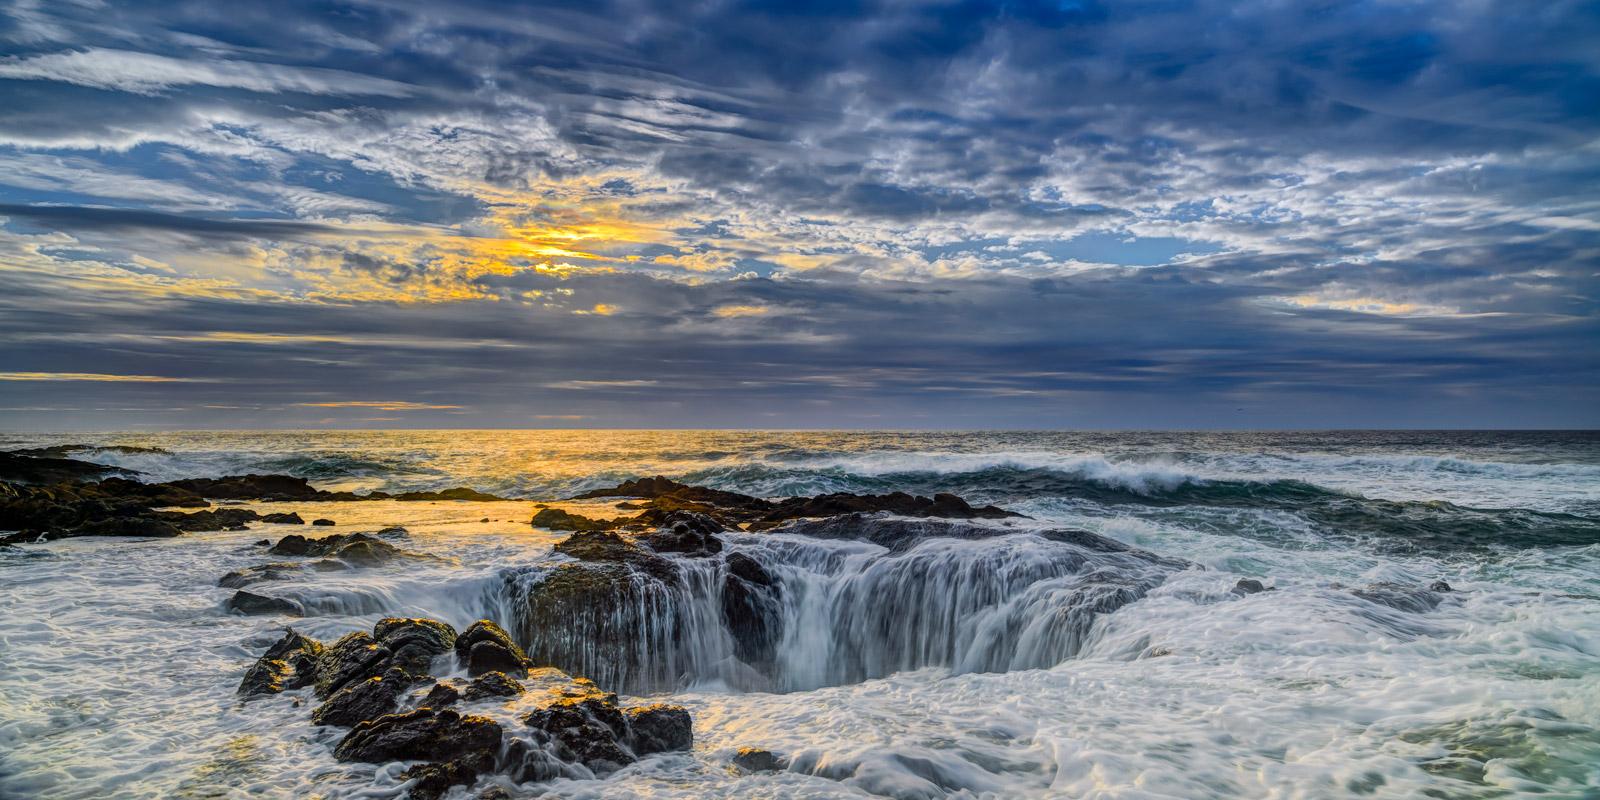 Oregon, Thors Well, Sunset, Coast, limited edition, photograph, fine art, landscape, coast, photo